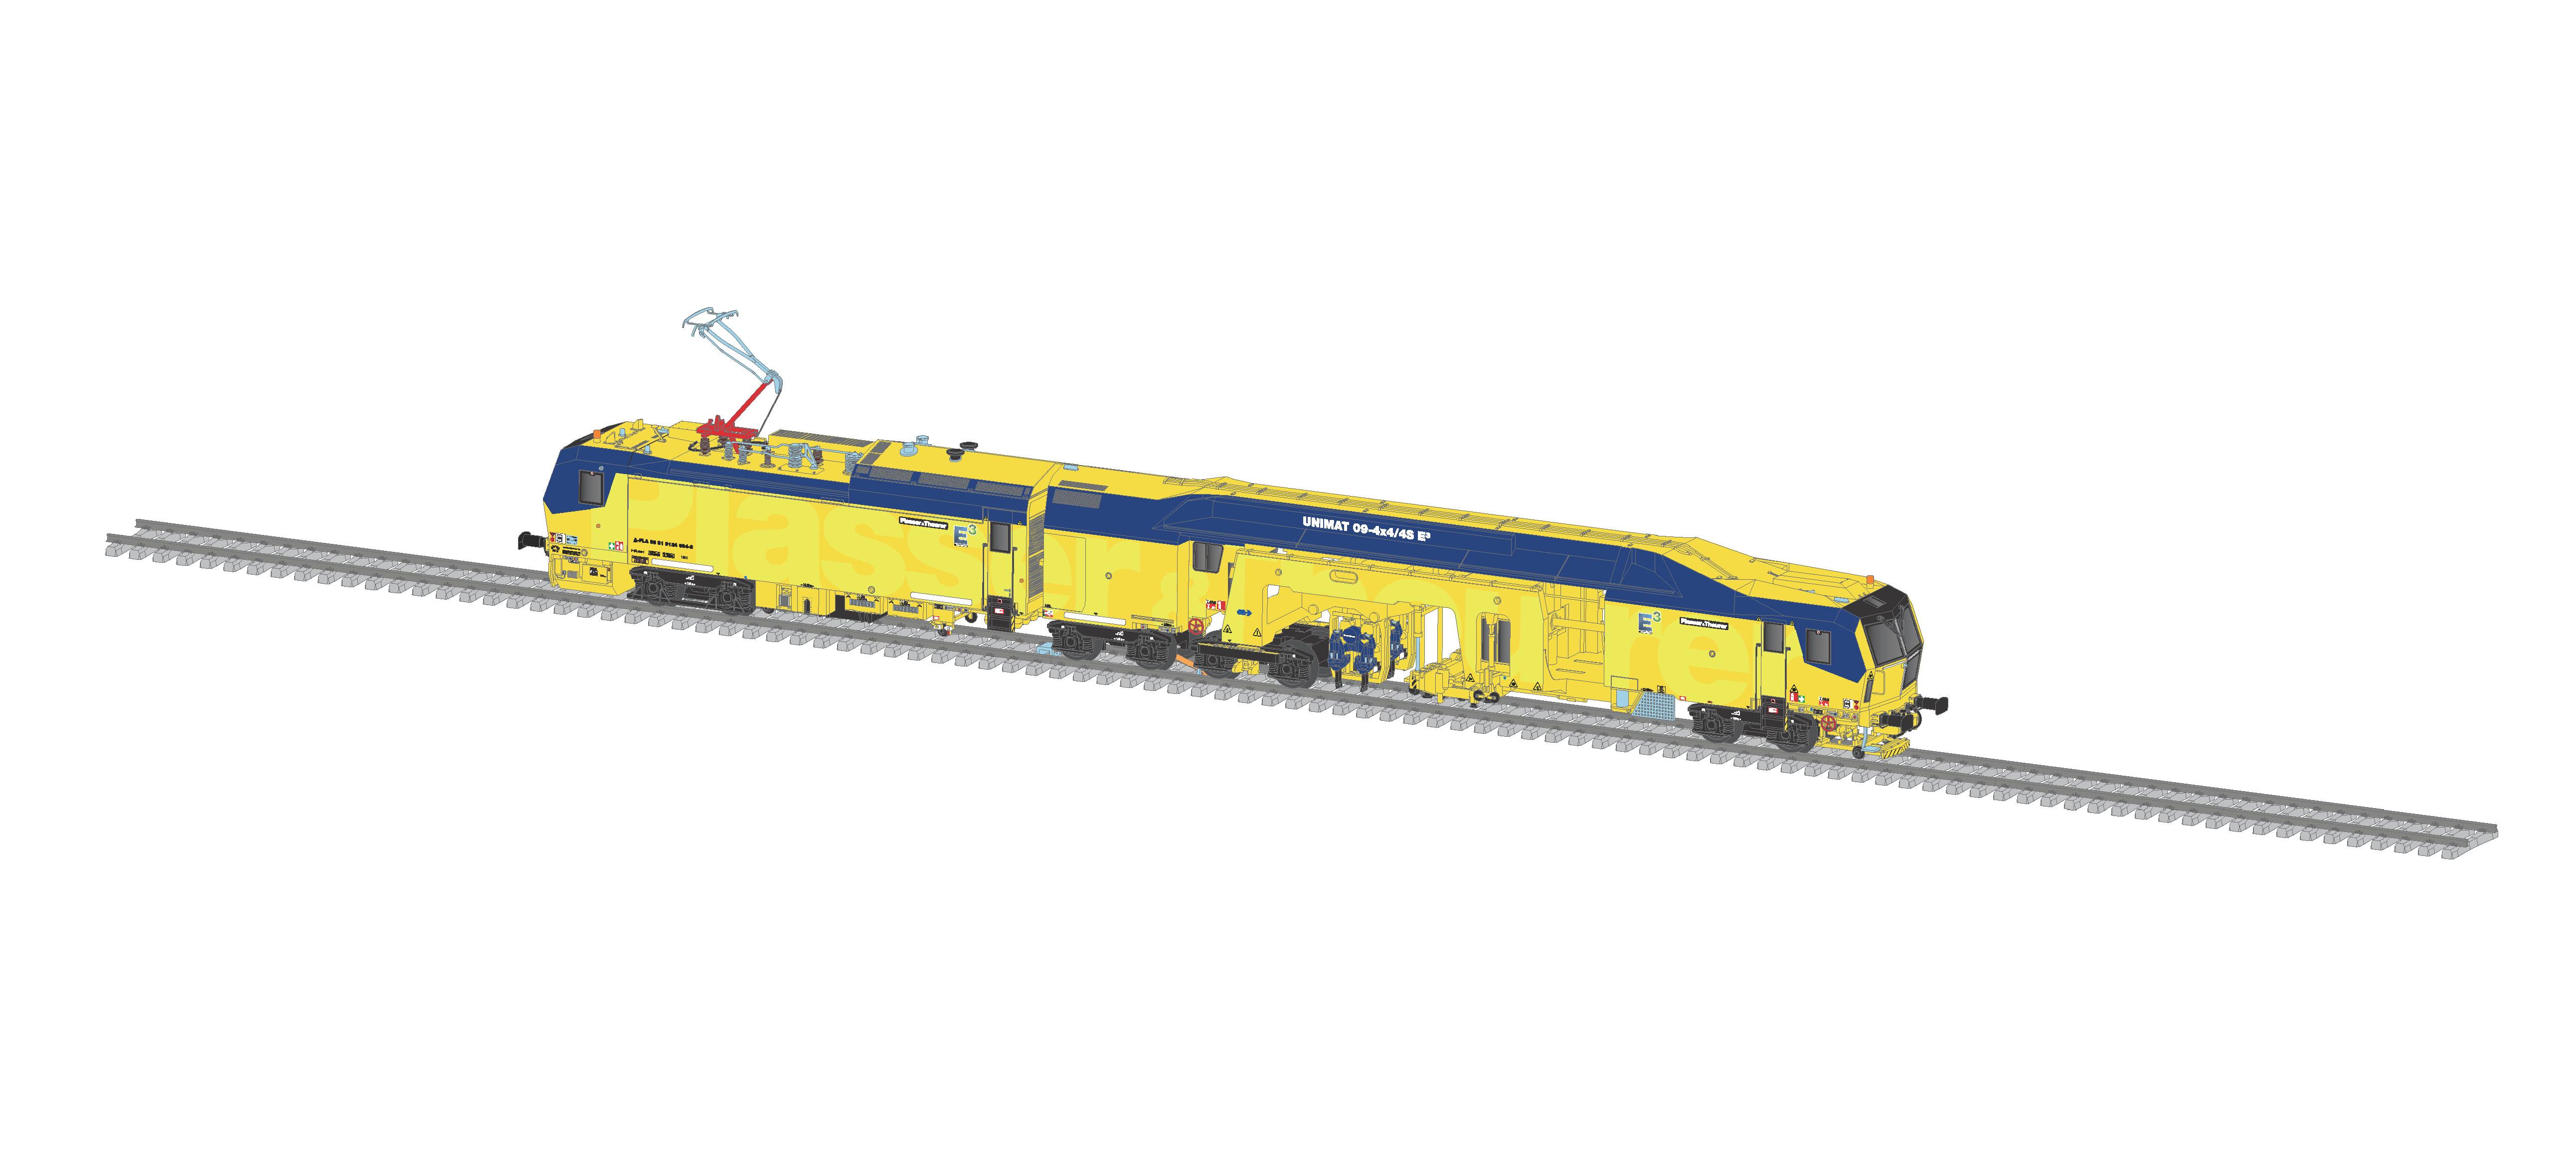 kibri 16700 <br/>Unimat 09-4x4/4S E³ Schienenstopfmaschine, P & T